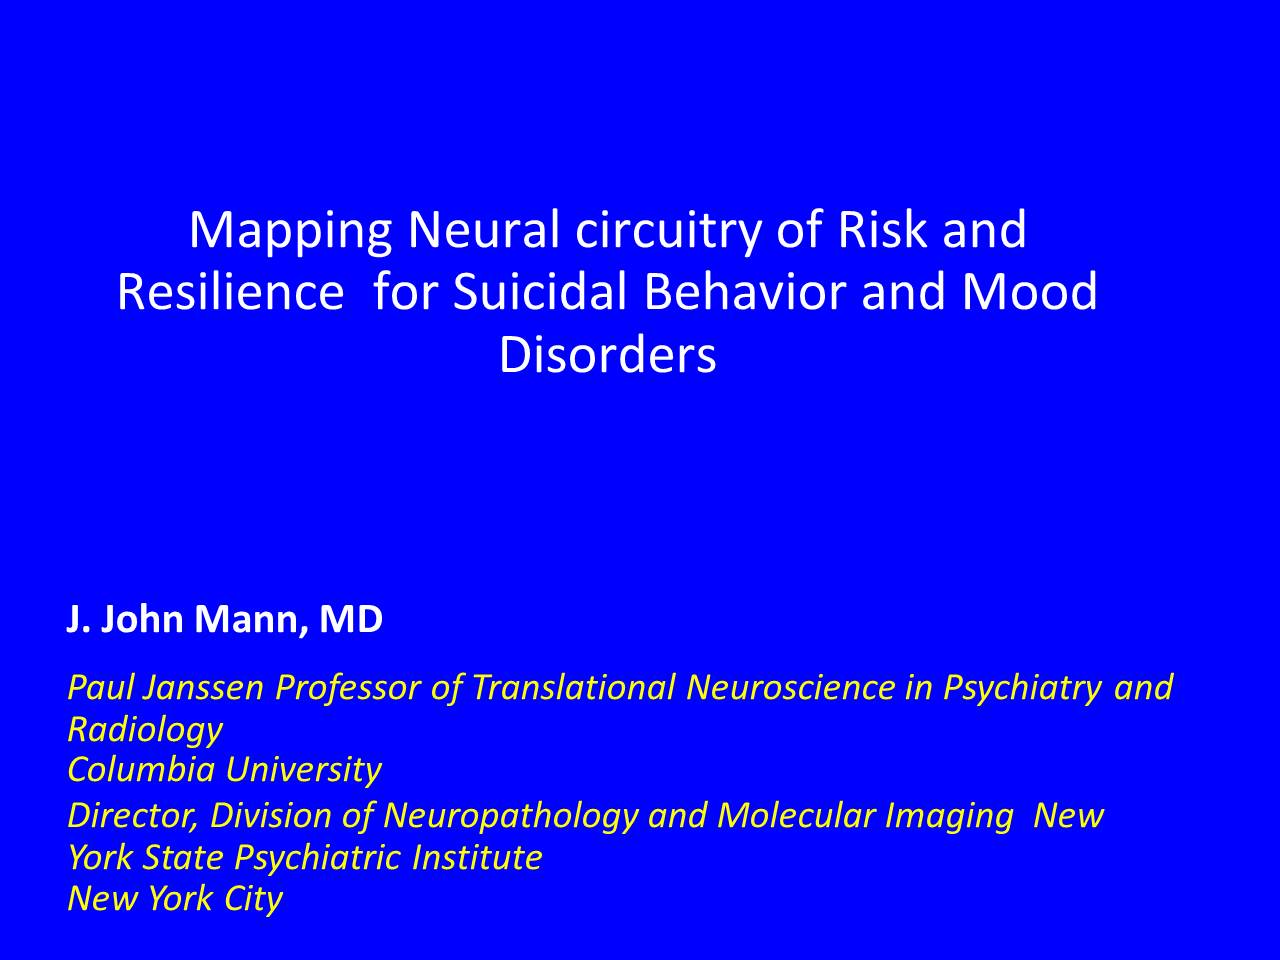 J john mann mapping neural circuitry of risk and resilience for j john mann mapping neural circuitry of risk and resilience for mood disorders and suicidal behavior fandeluxe Images